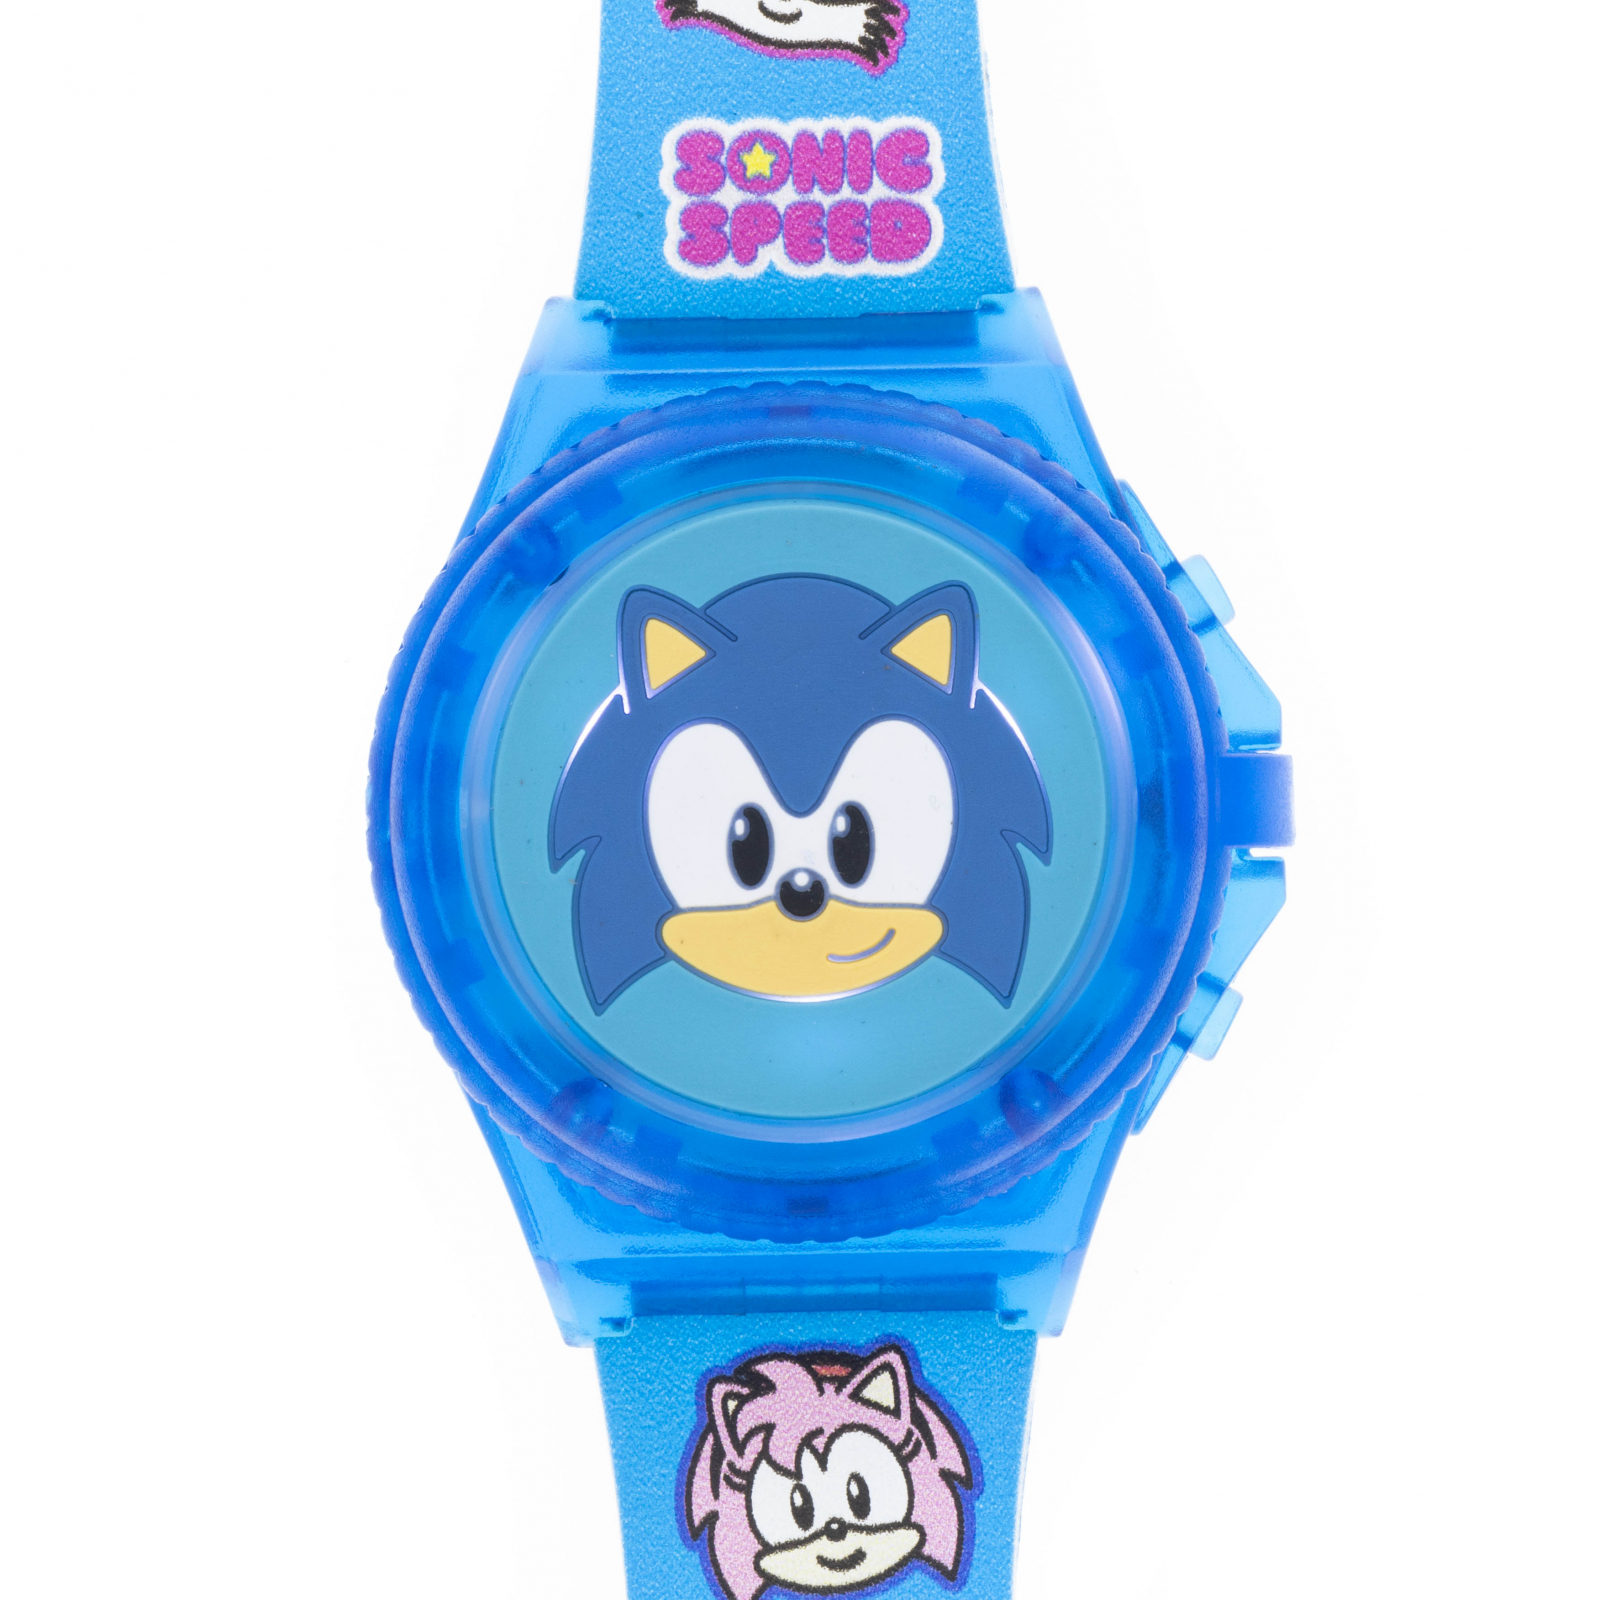 Sonic the Hedgehog Kids Digital Read Wrist Watch - Blue